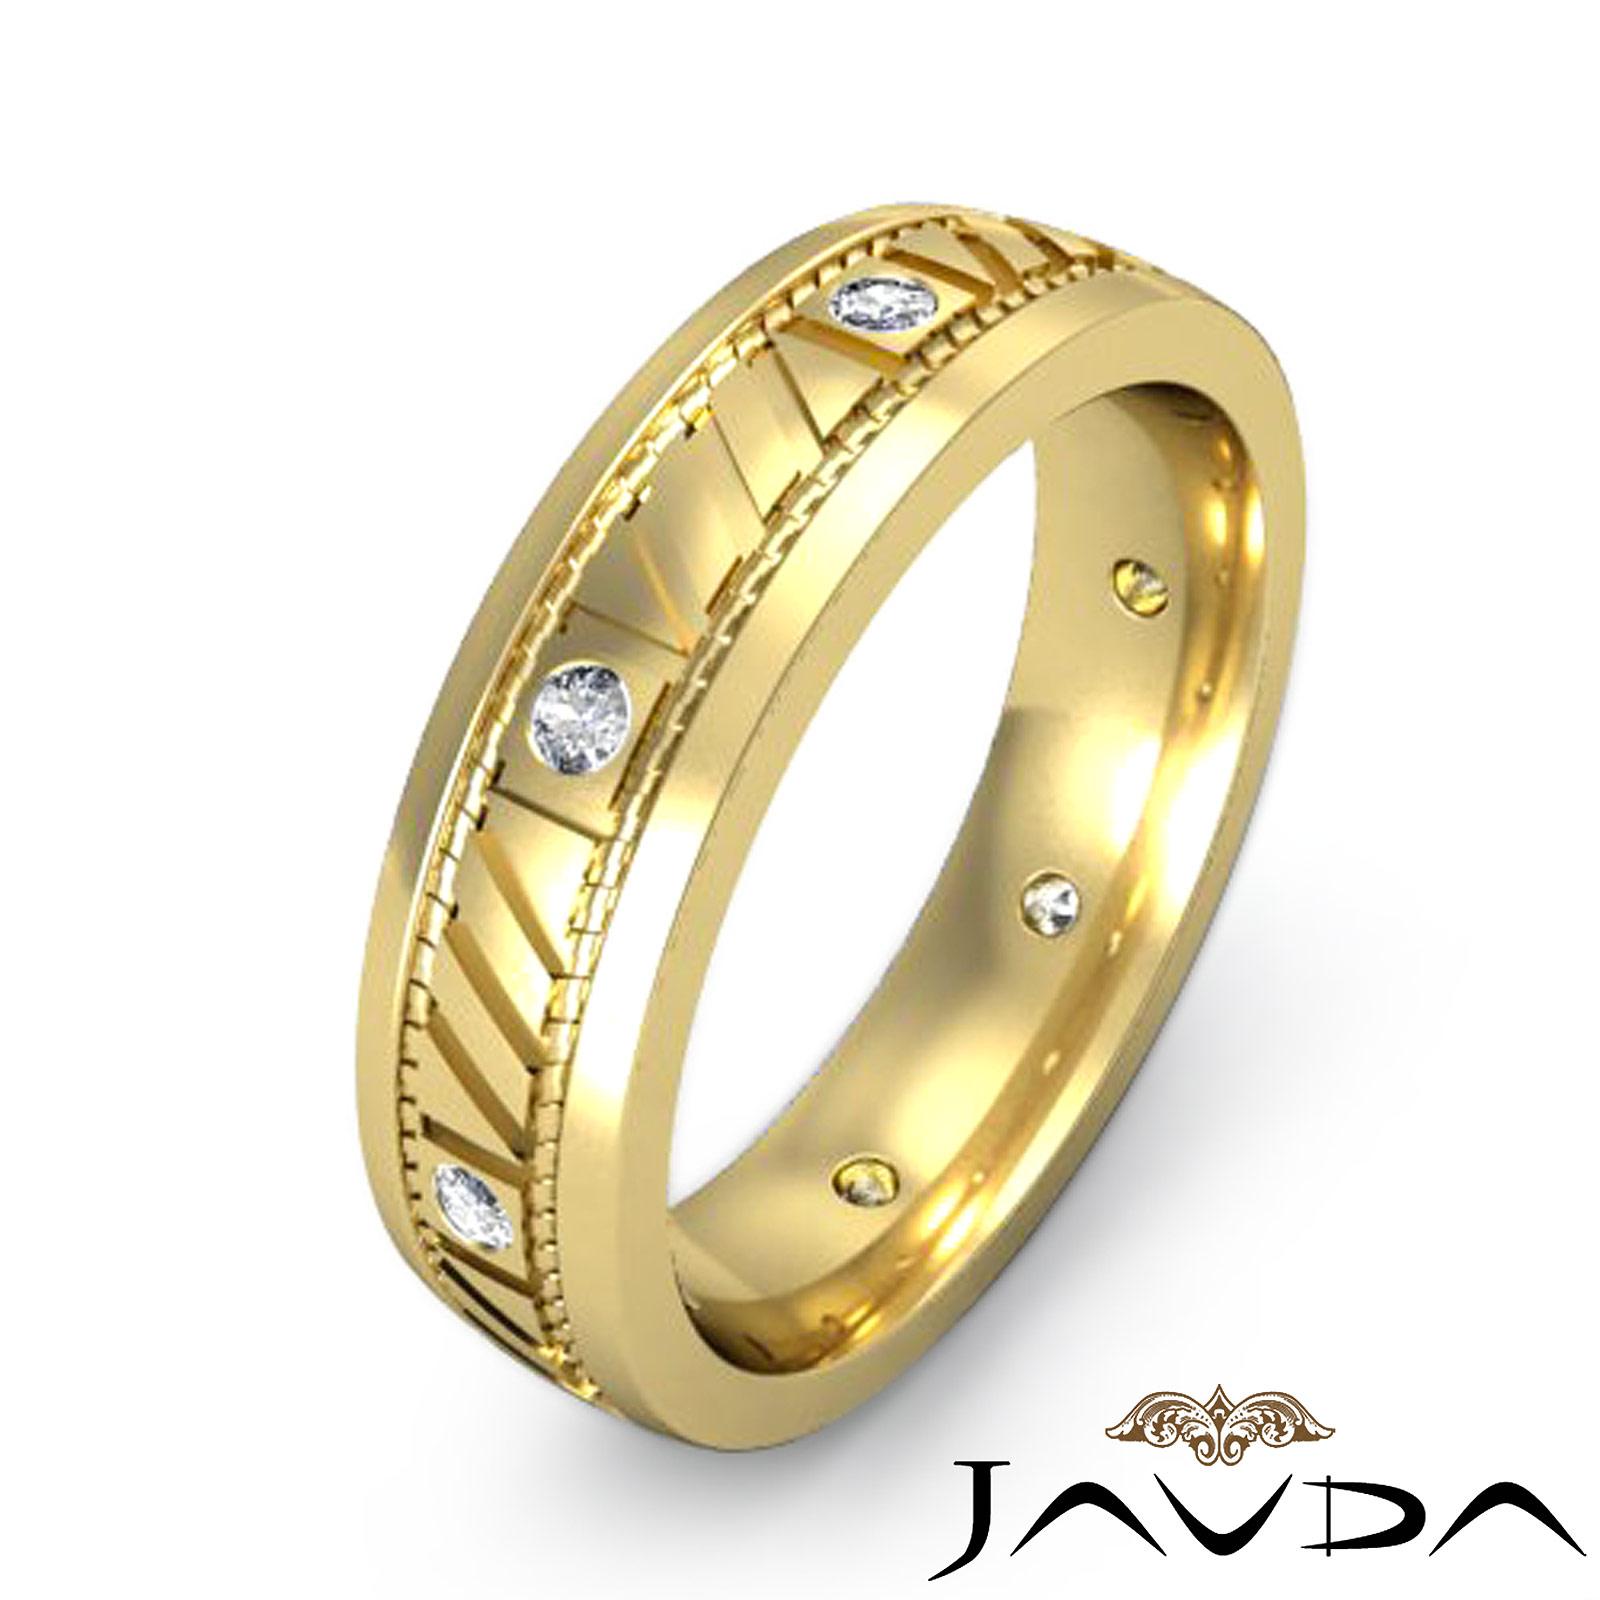 Mens solid ring eternity wedding bezel round diamond band for Mens eternity wedding band